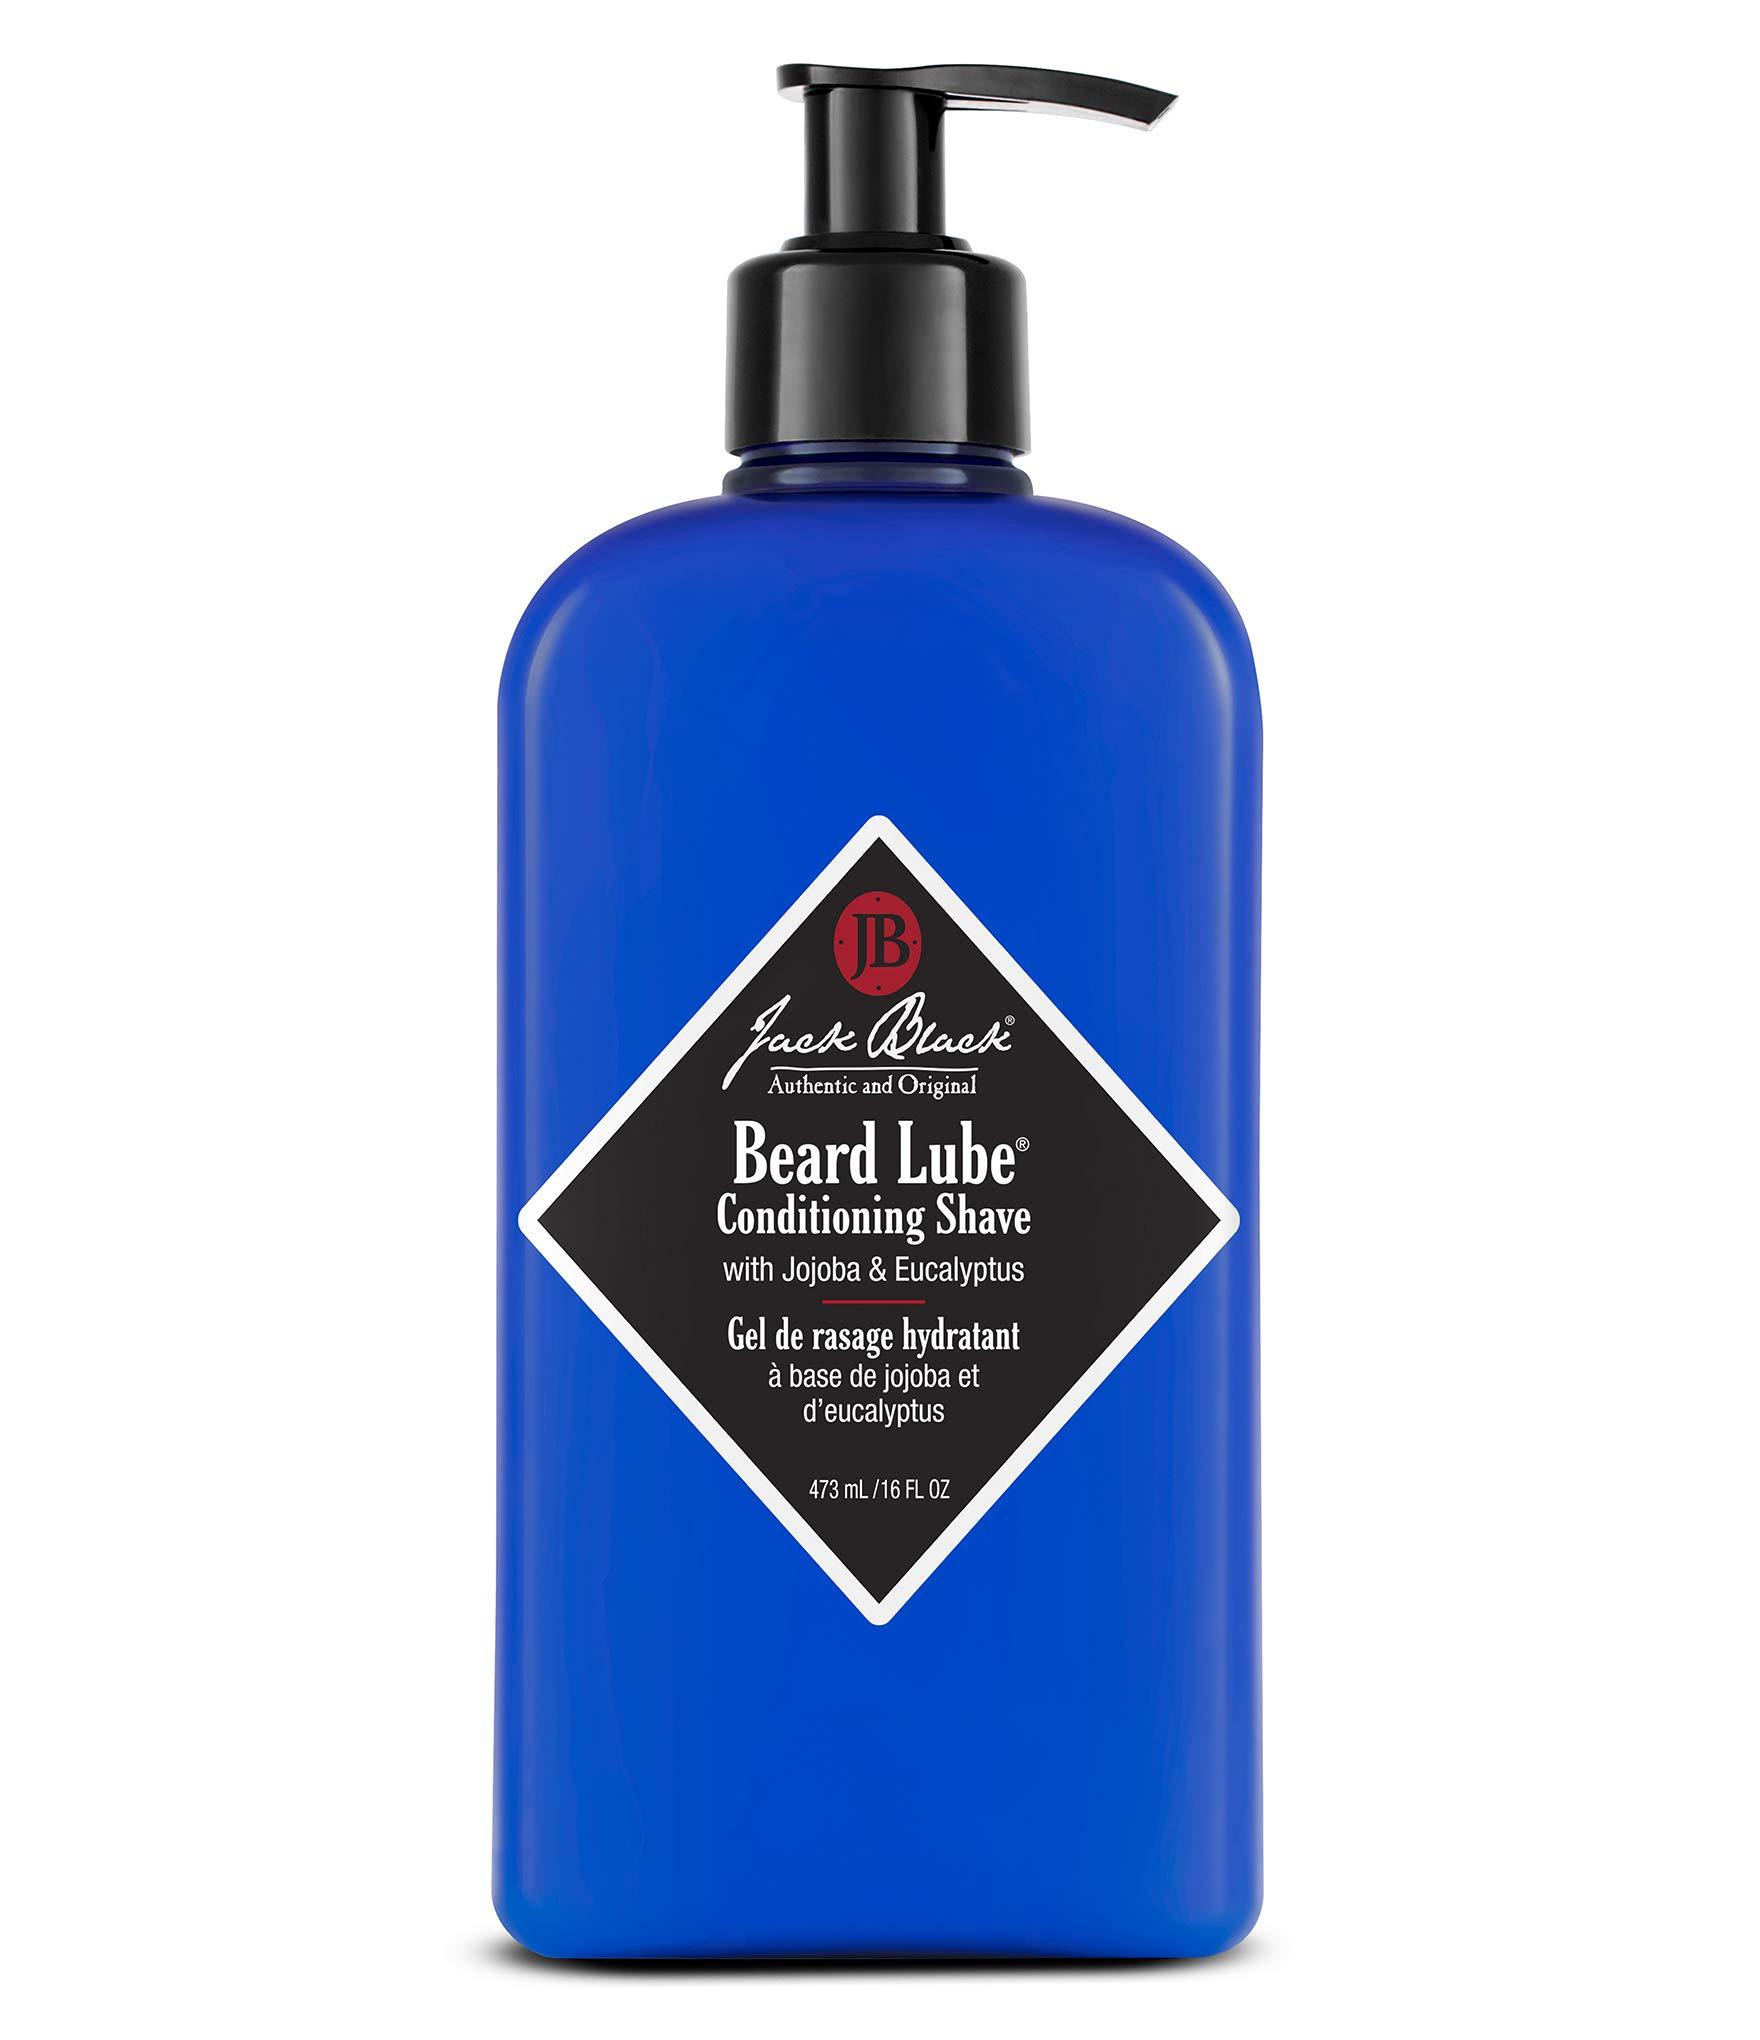 Jack Black Beard Lube Conditioning Shave, 16 fl. oz.